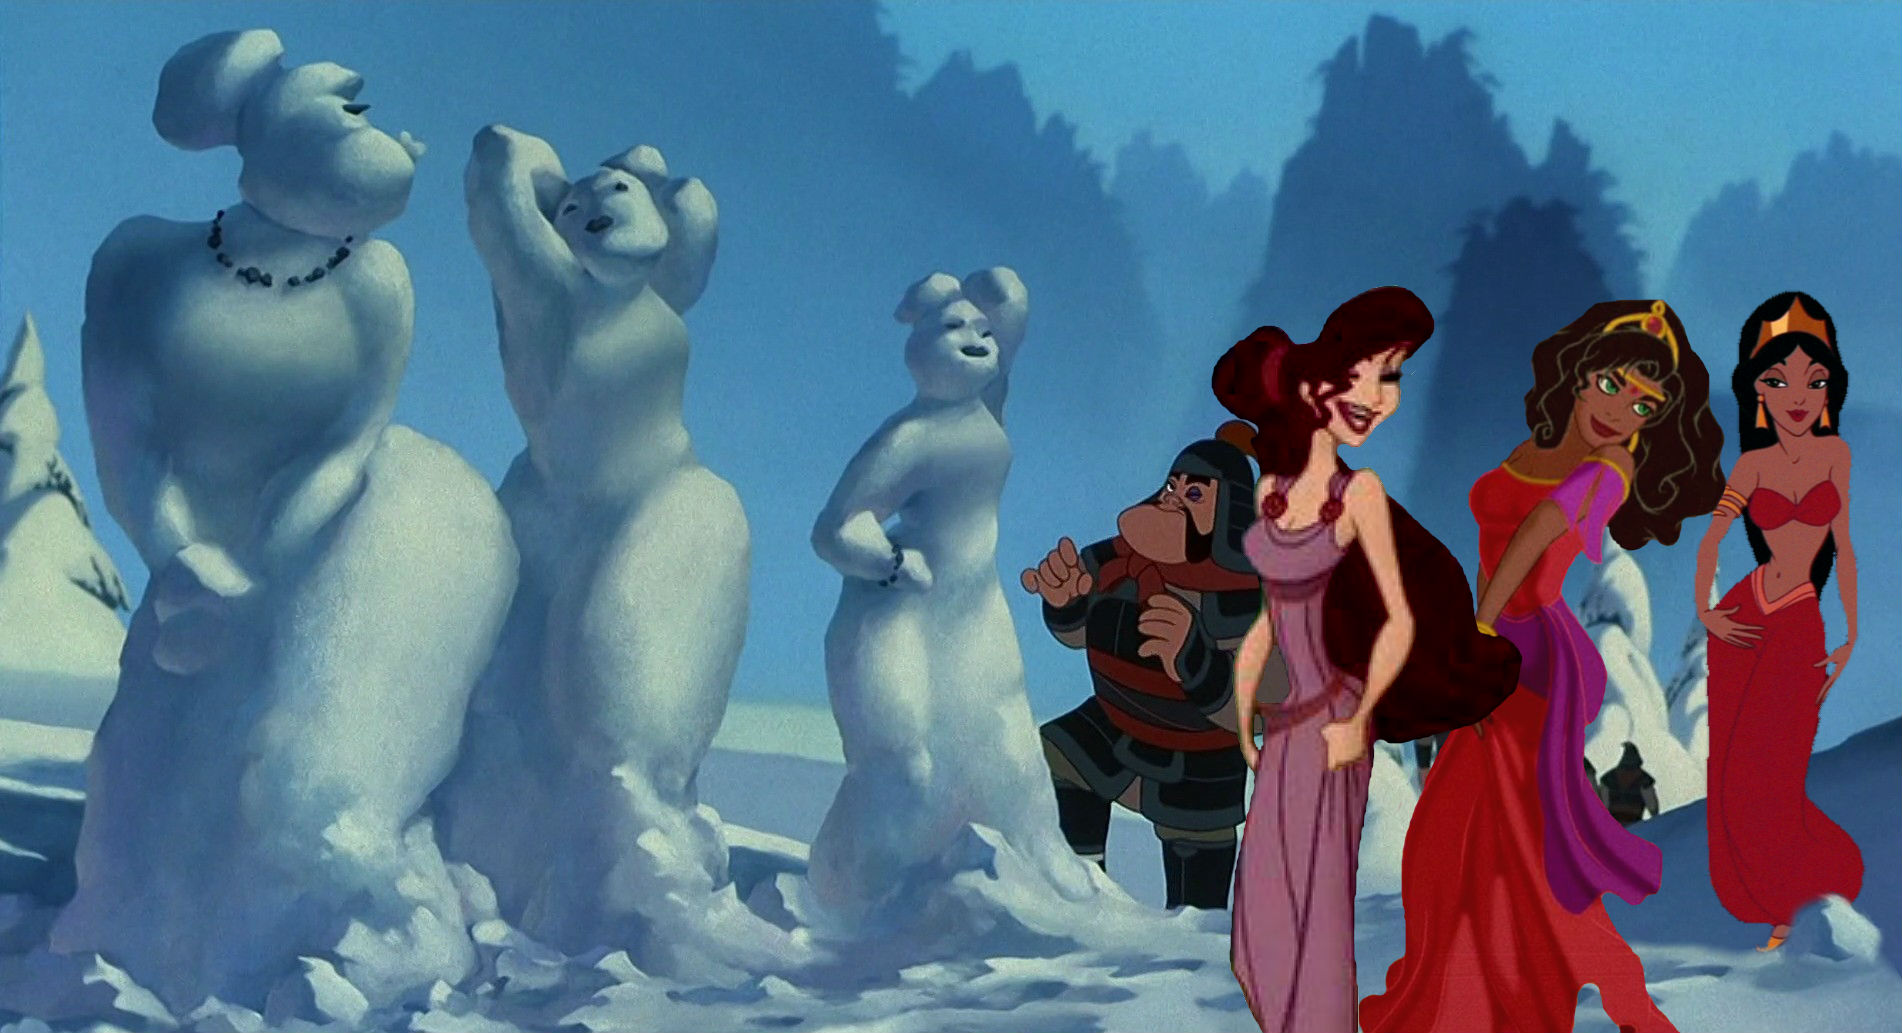 Yao: Snow Sculptor Extraordinaire